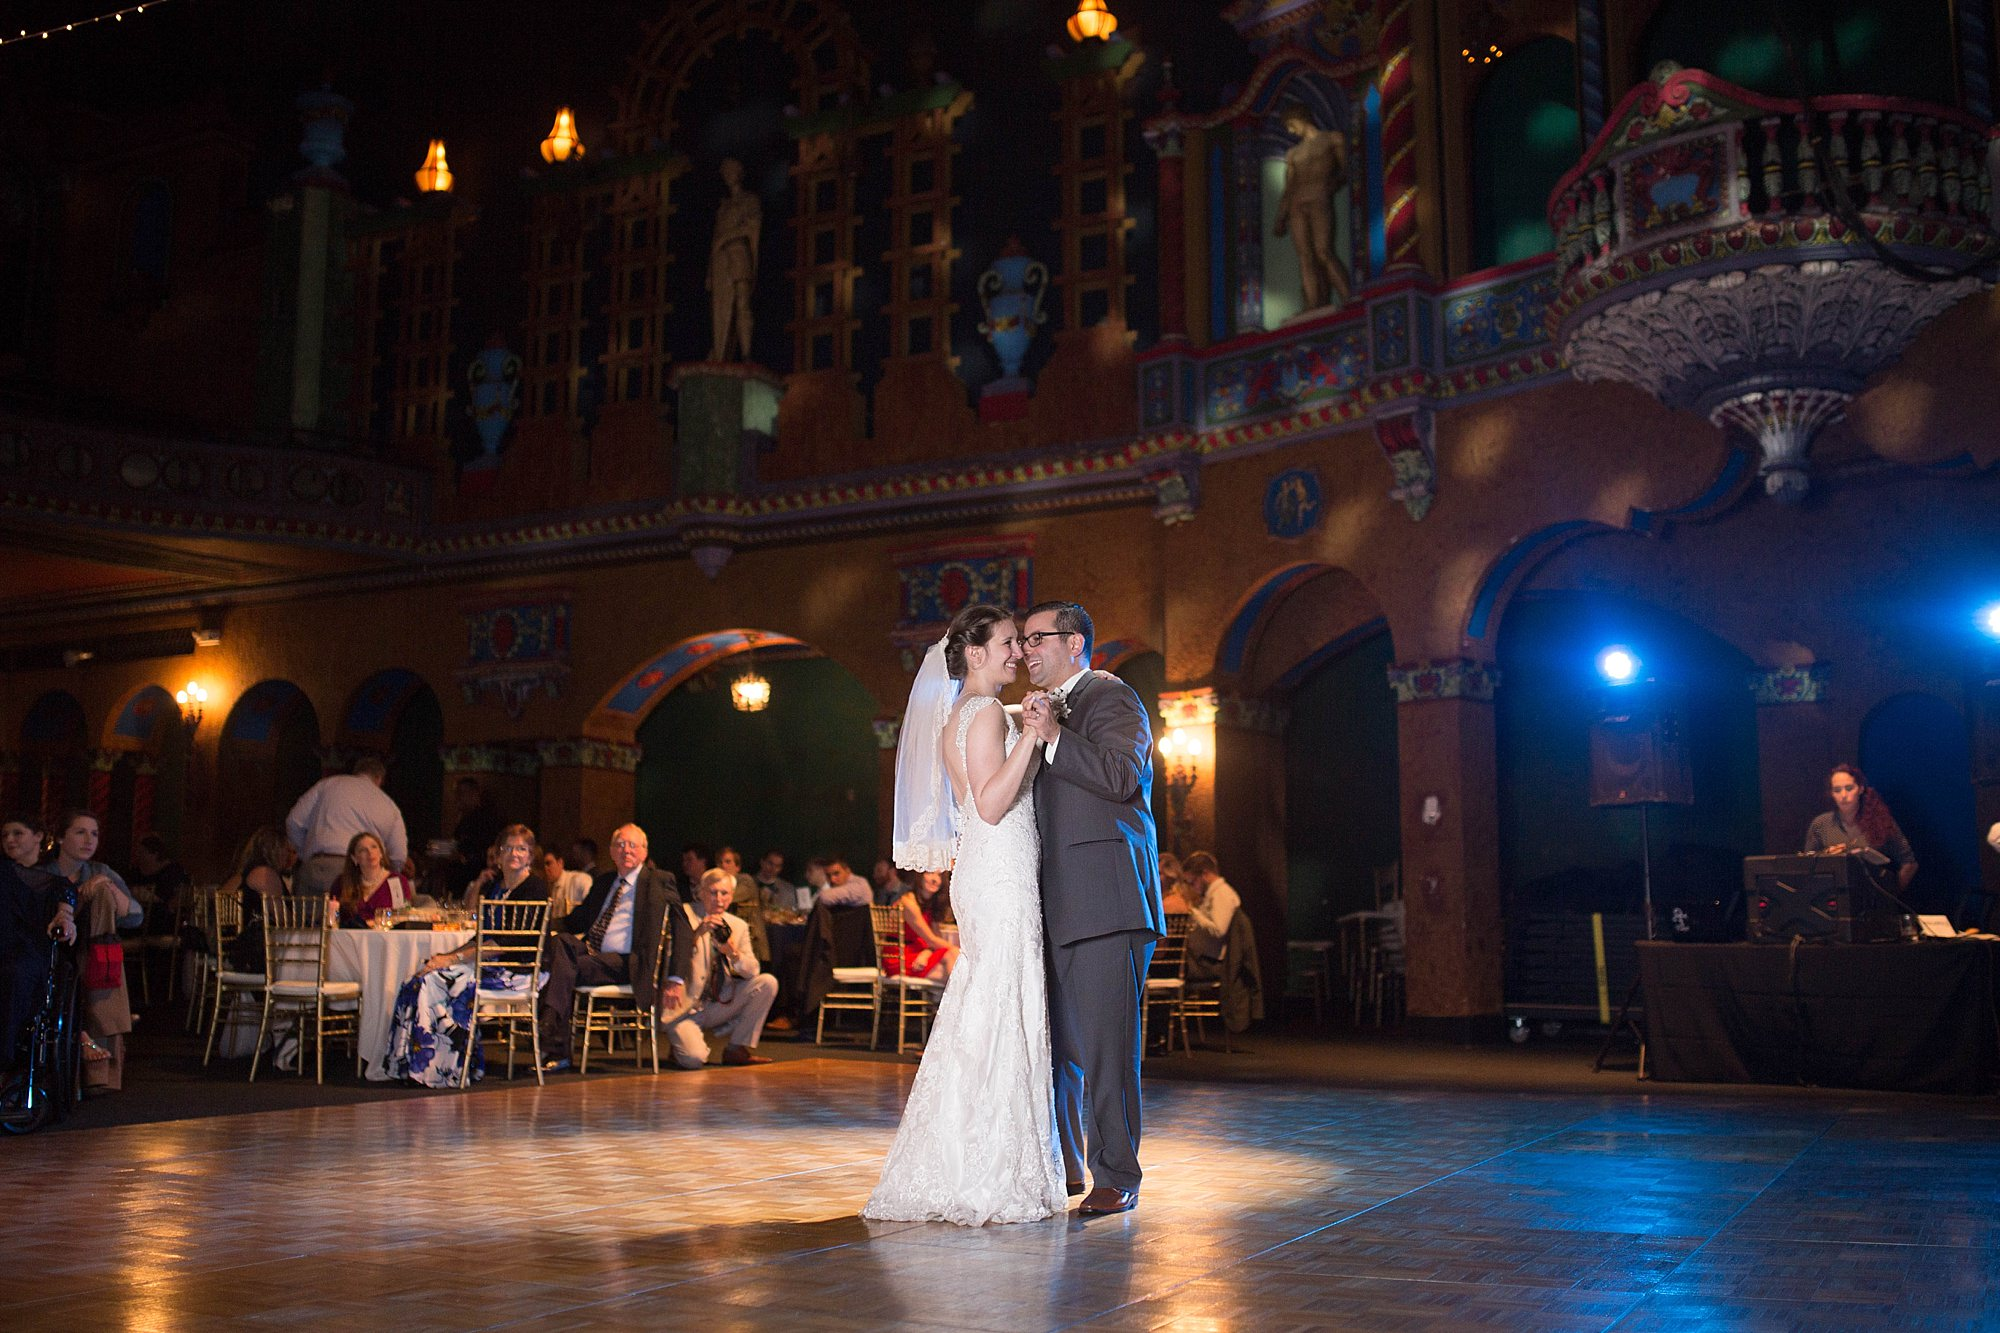 Uptown Theater - Kansas City Wedding Venue